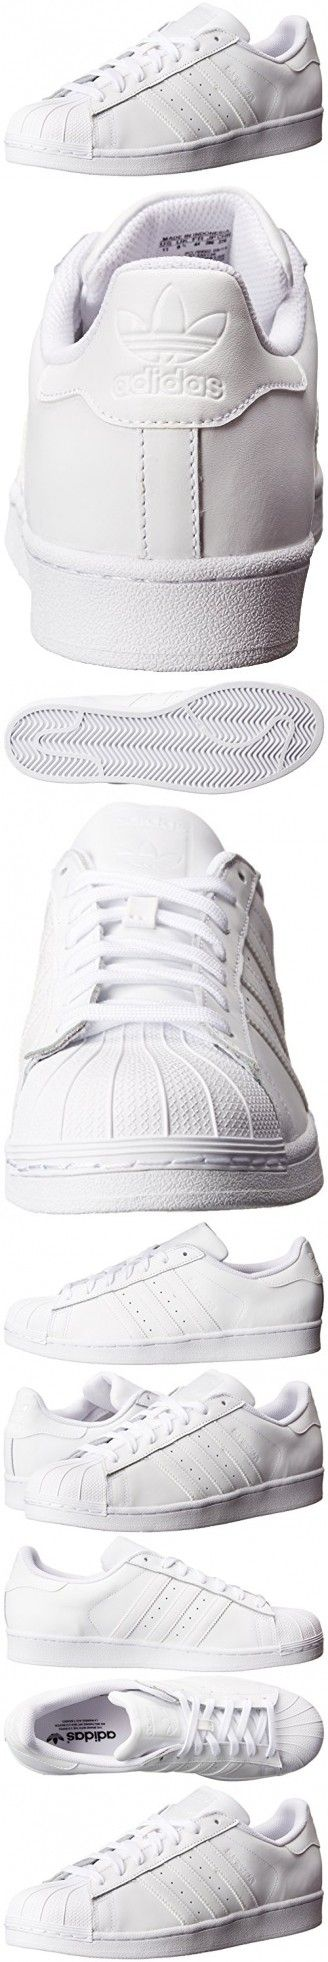 Adidas Originals Women's Superstar Foundation Casual Sneaker,  White/White/White,  9.5 M US